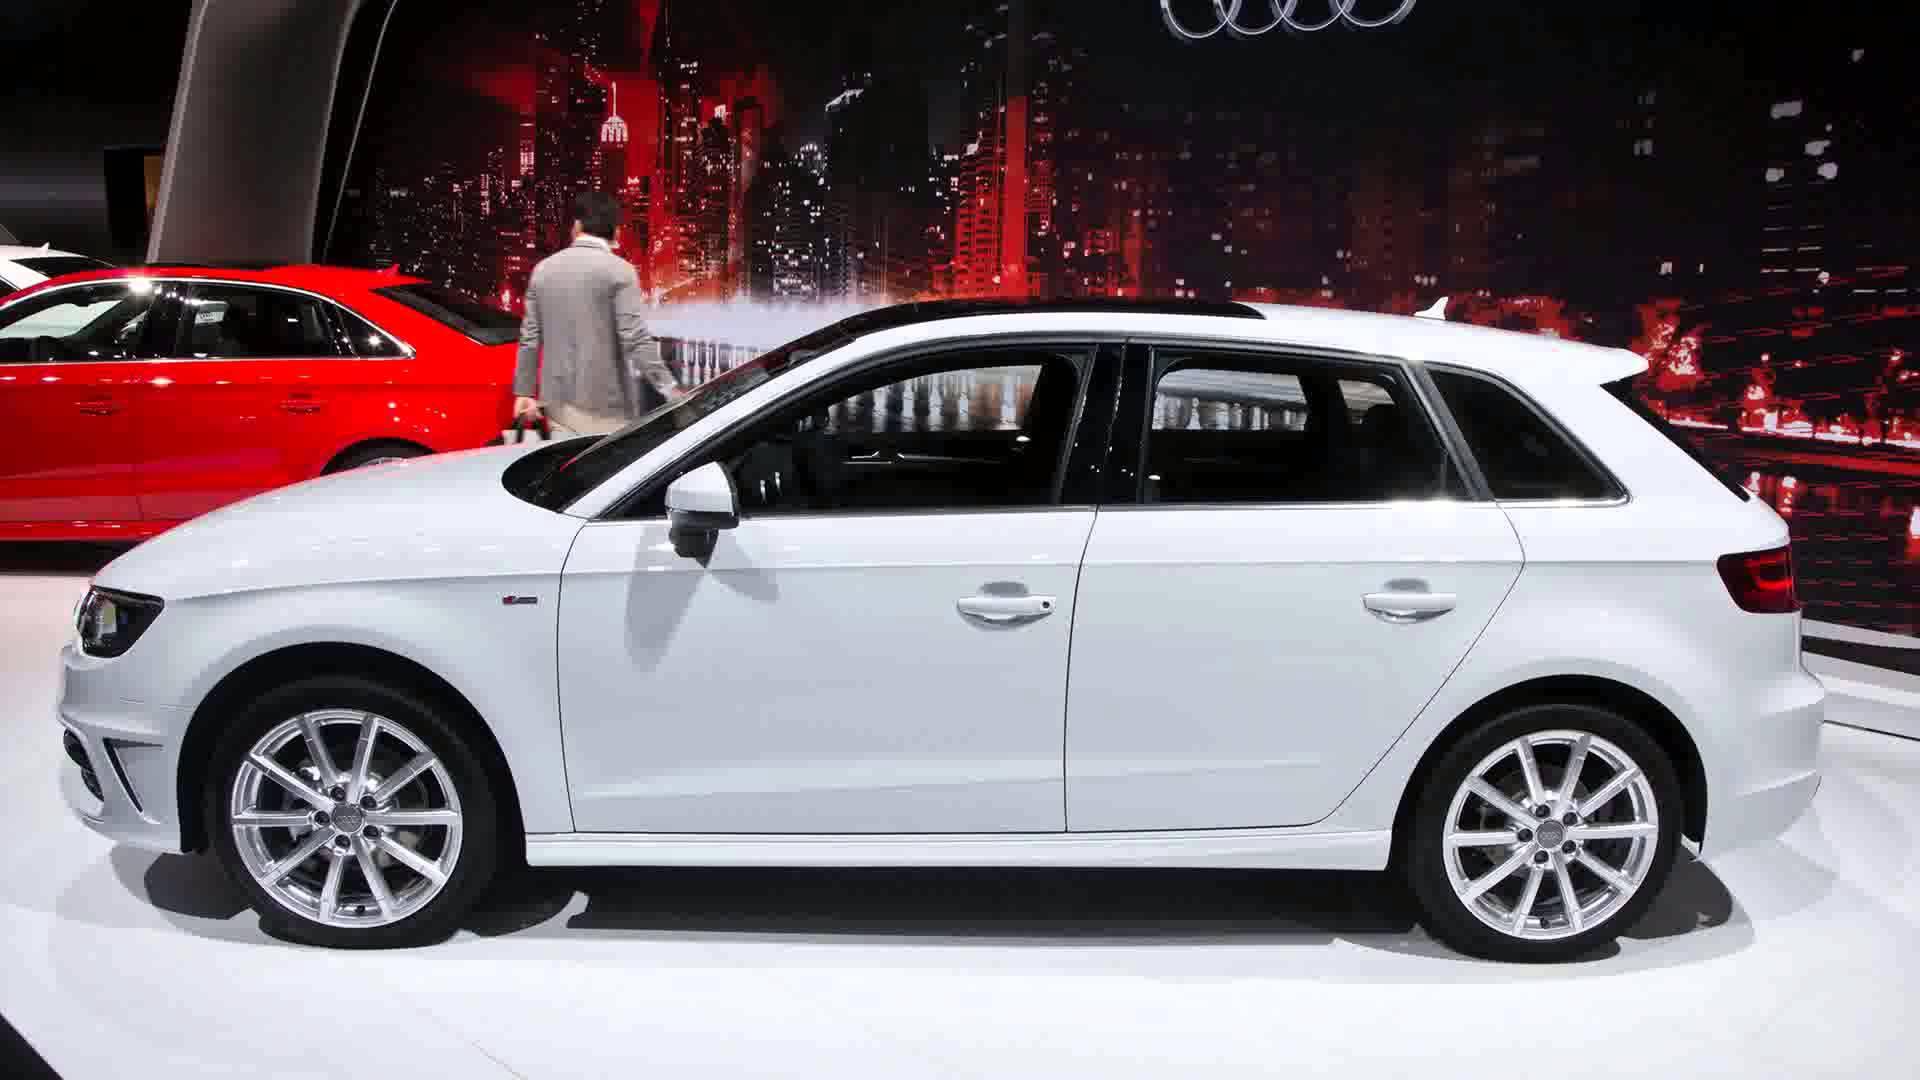 Audi A3 Hatchback 2017 M 225 S Moderno Y M 225 S Potente Lista